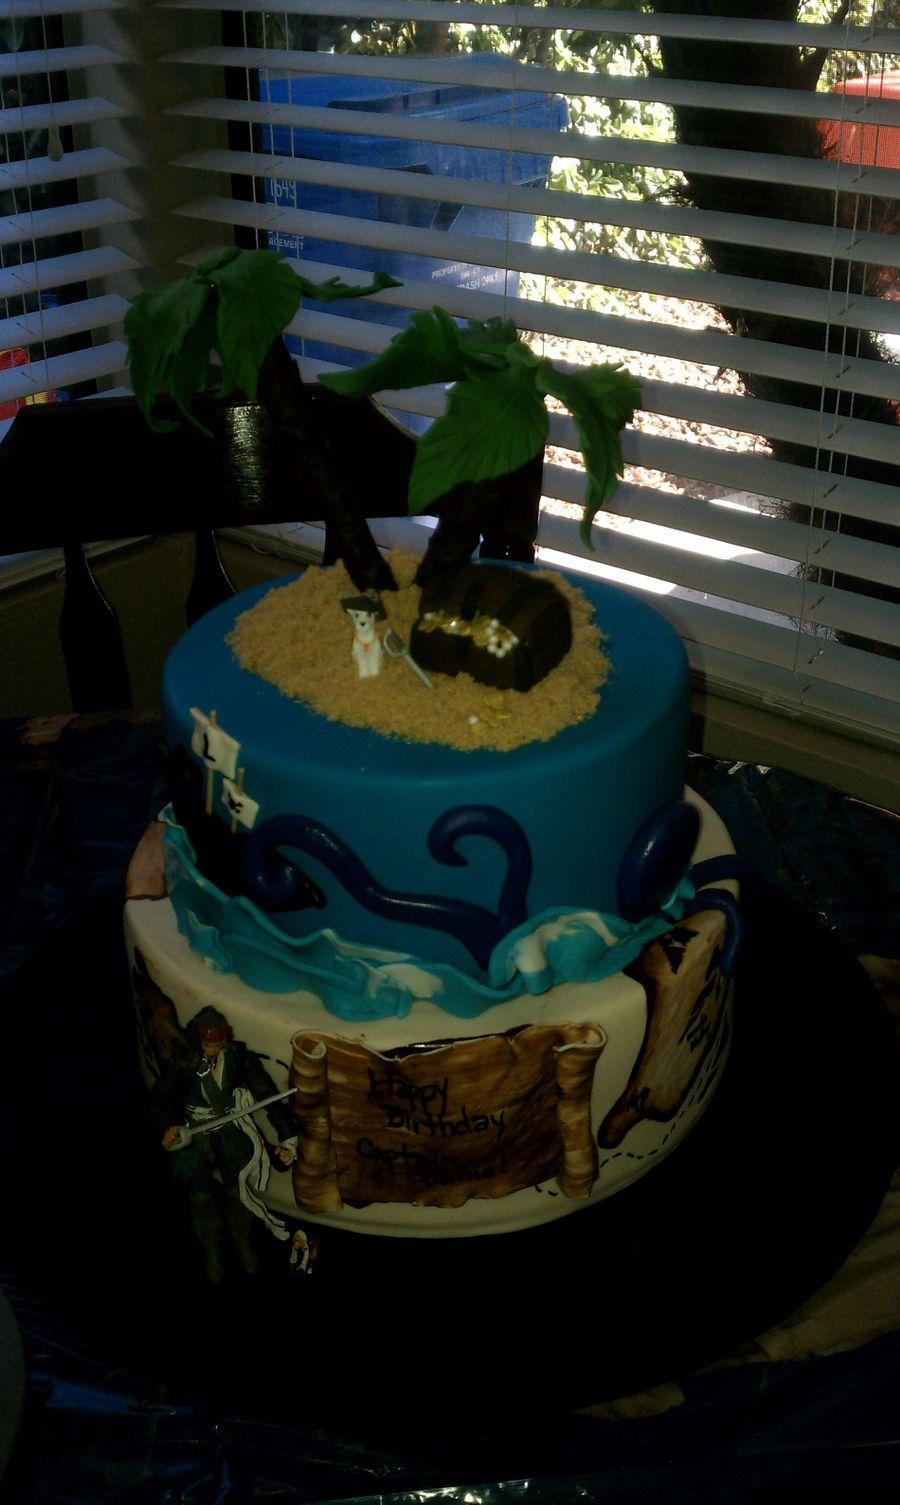 Tremendous Pirate Daniels 1St Birthday Cakecentral Com Funny Birthday Cards Online Aeocydamsfinfo